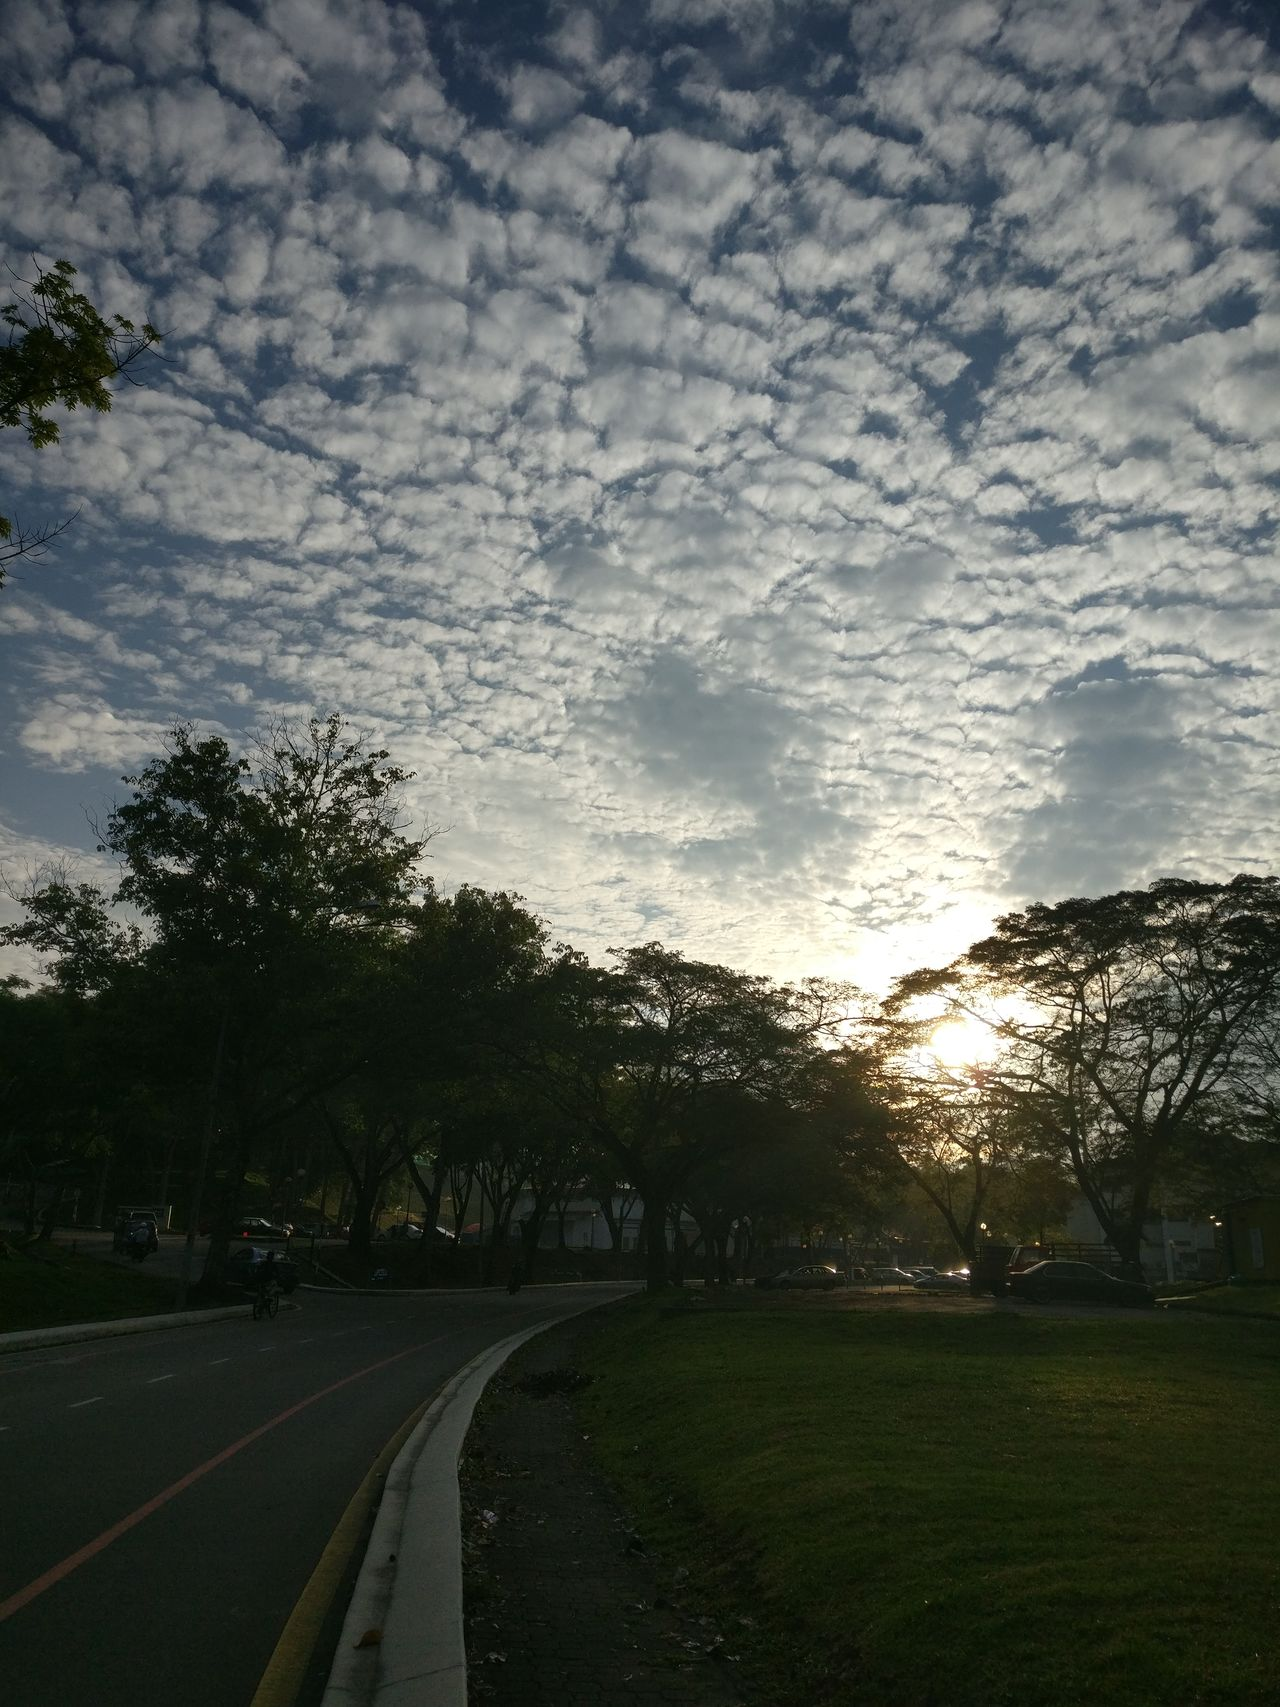 Morning at University Technology Malaysia Cloud Cloud - Sky Johor Malaysia Morning Nature Oneplus3 Road Sky Sun Sunlight Sunrise Tree Utm Utm Skudai